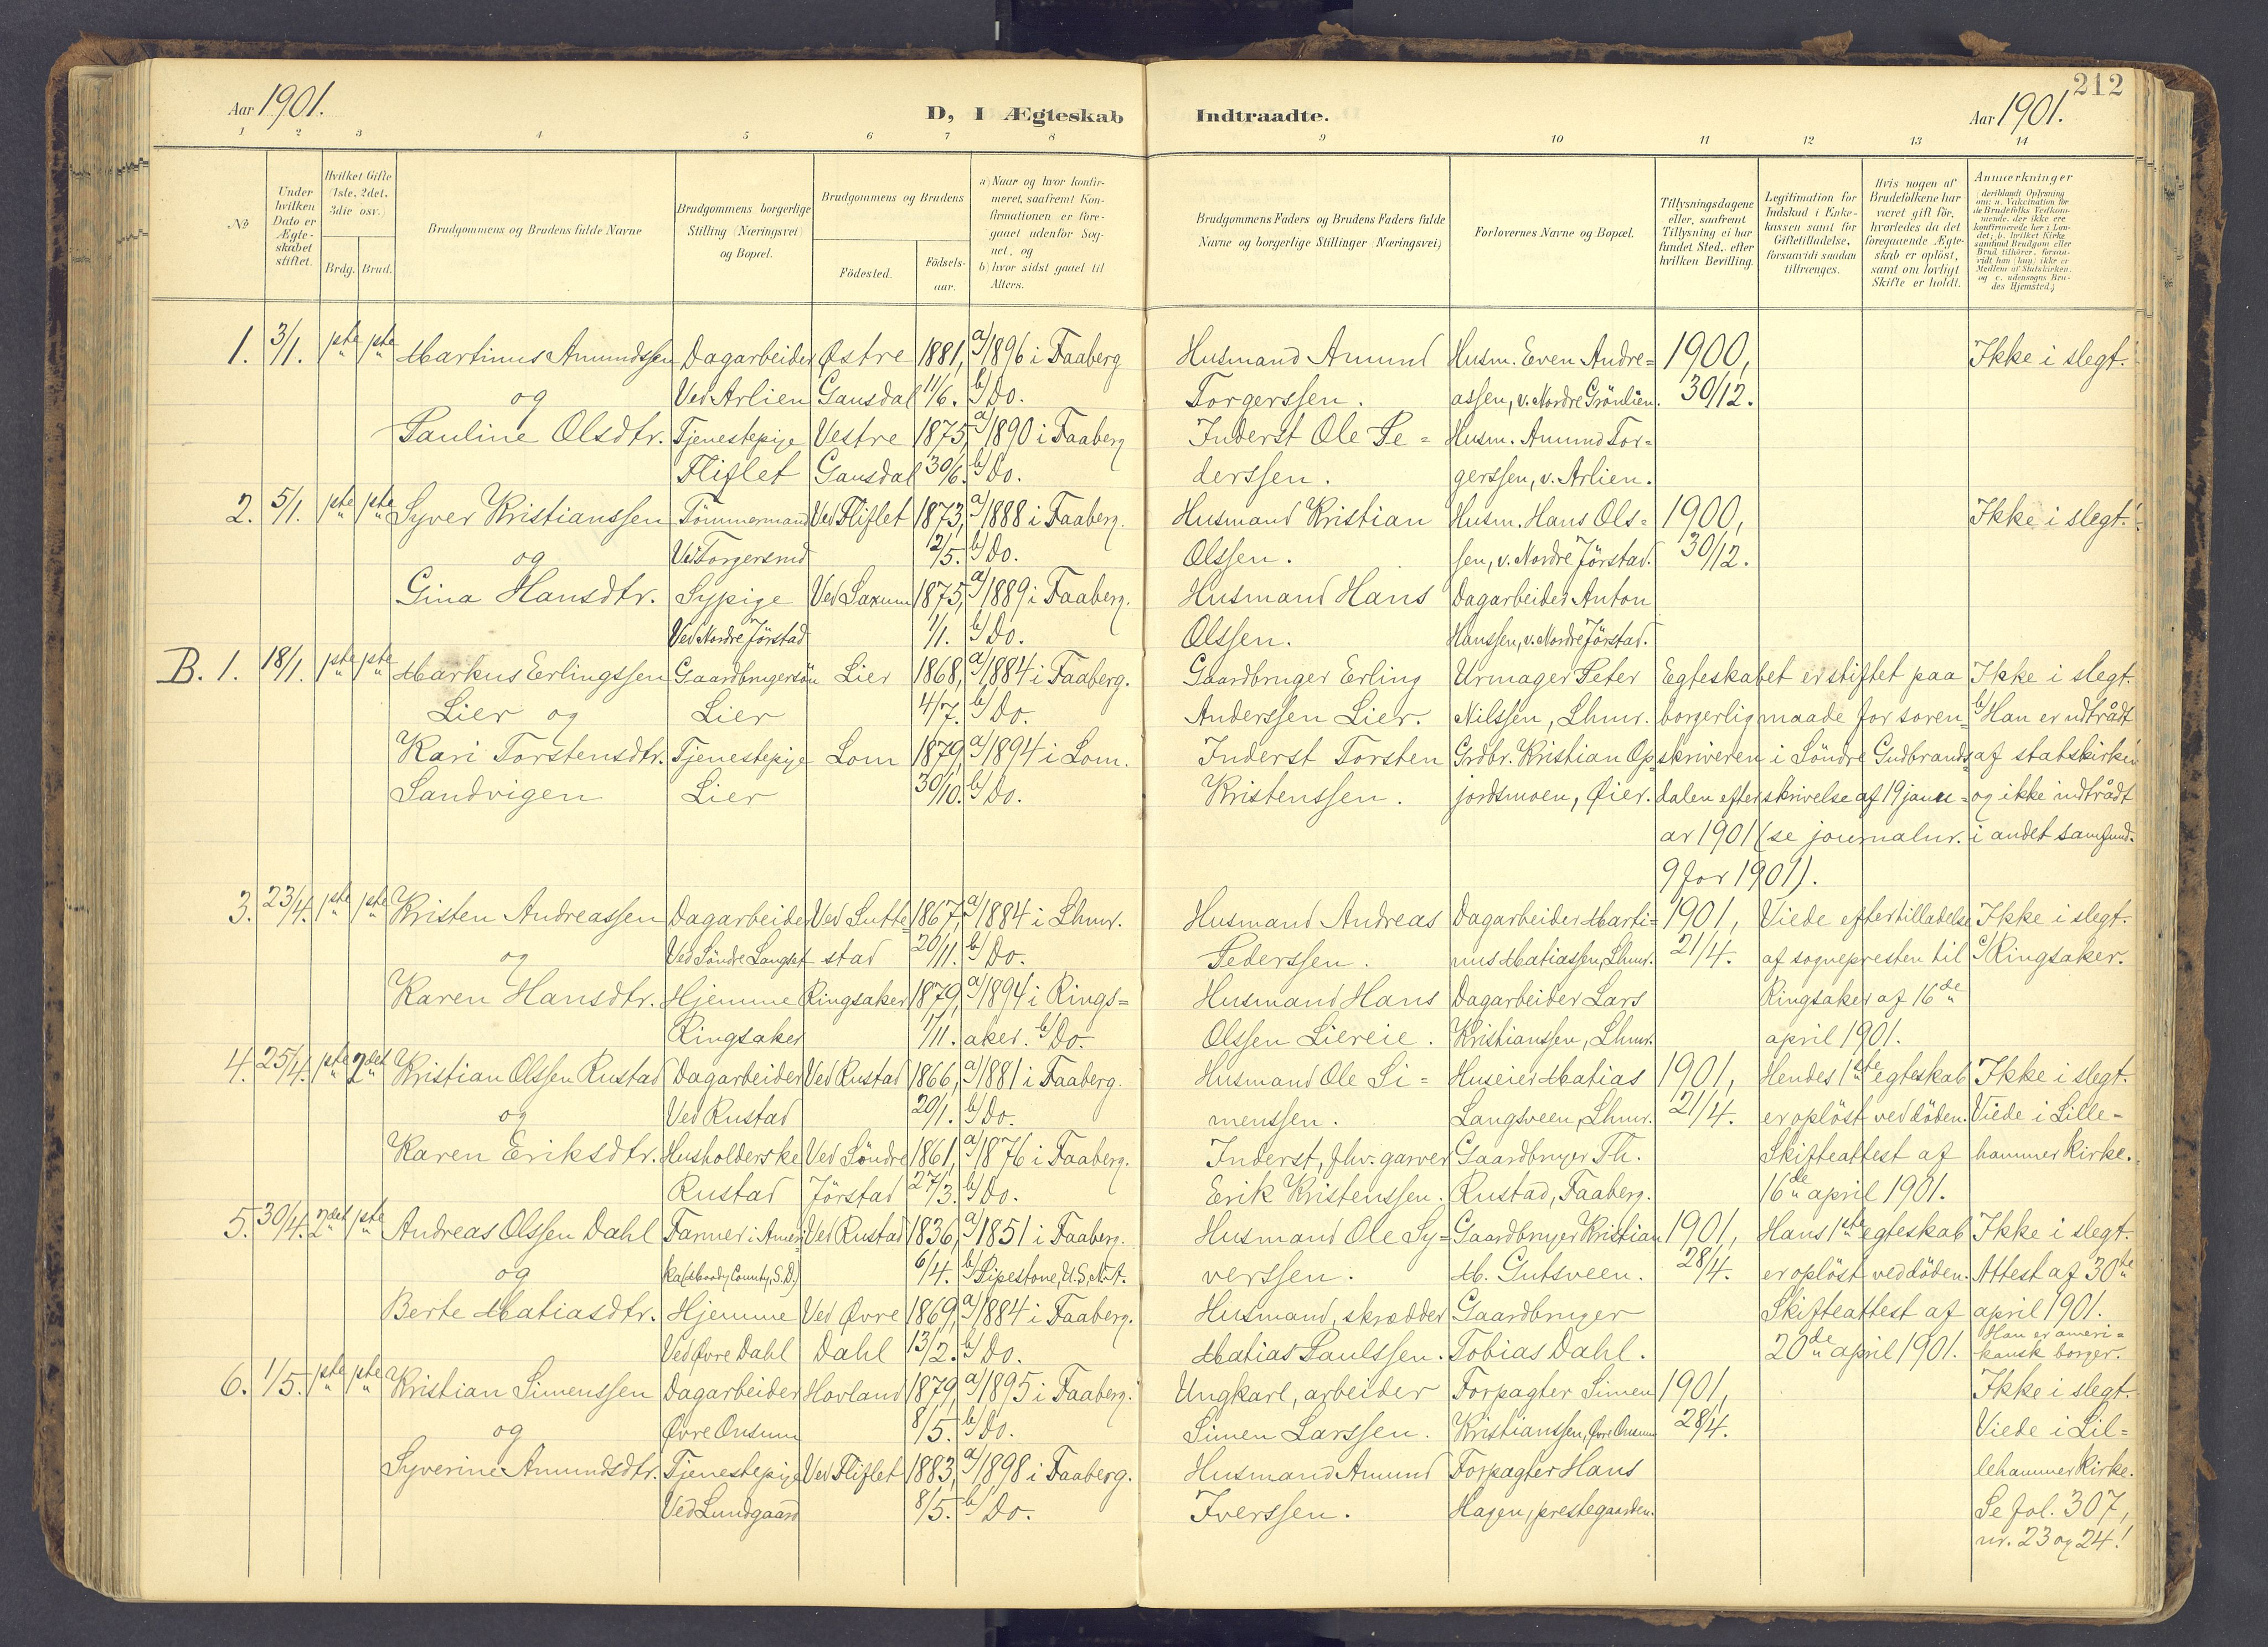 SAH, Fåberg prestekontor, Ministerialbok nr. 12, 1899-1915, s. 212